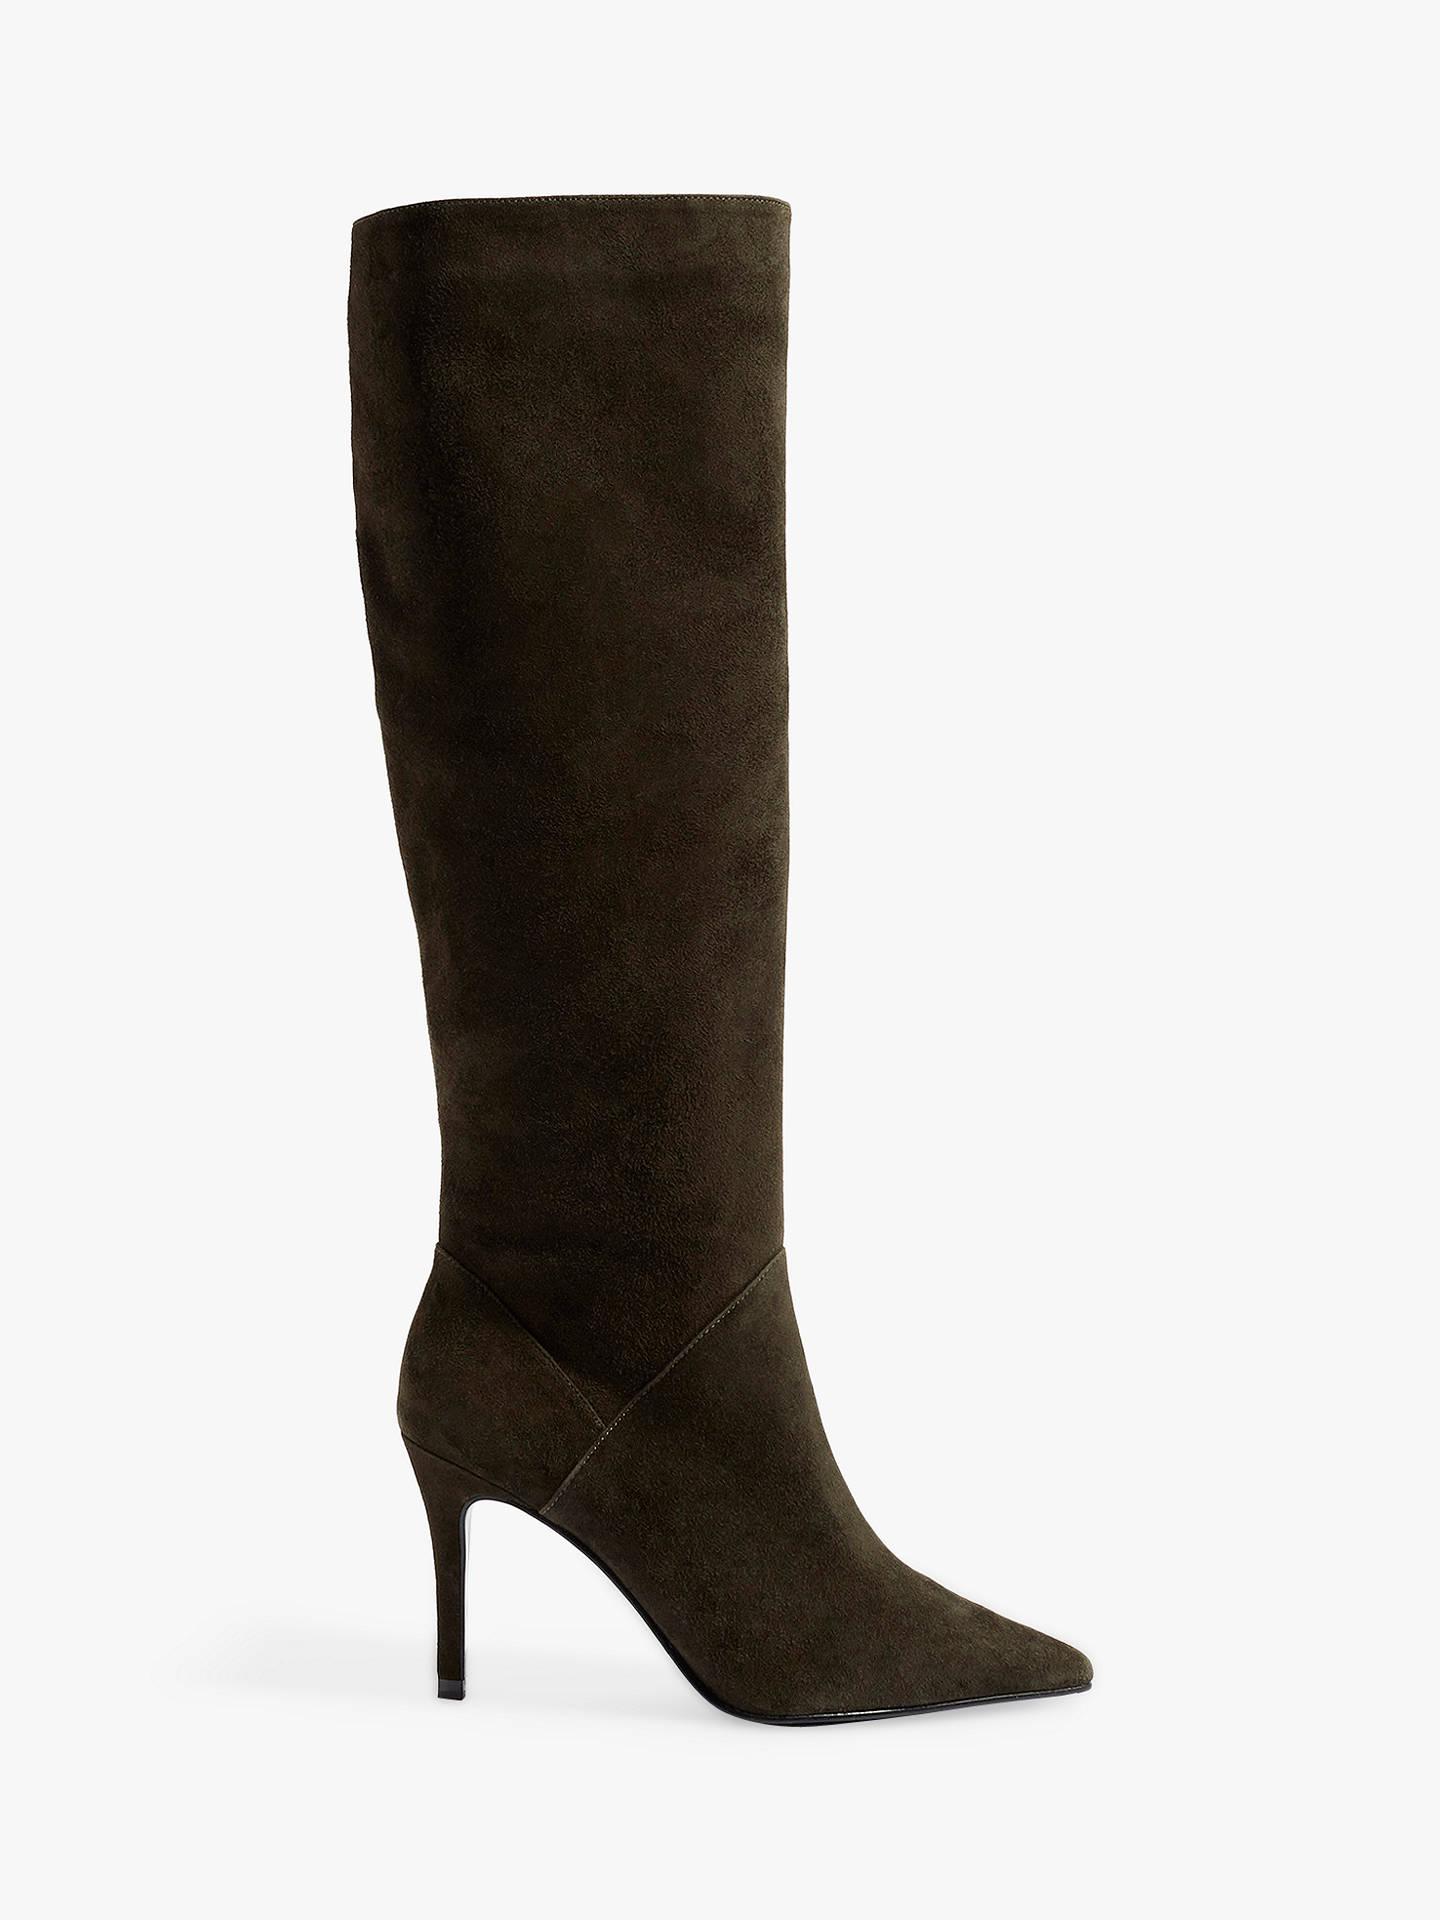 e1f20a3330d0c9 Buy Karen Millen Stiletto Heel Knee High Boots, Olive Leather, 3 Online at  johnlewis ...